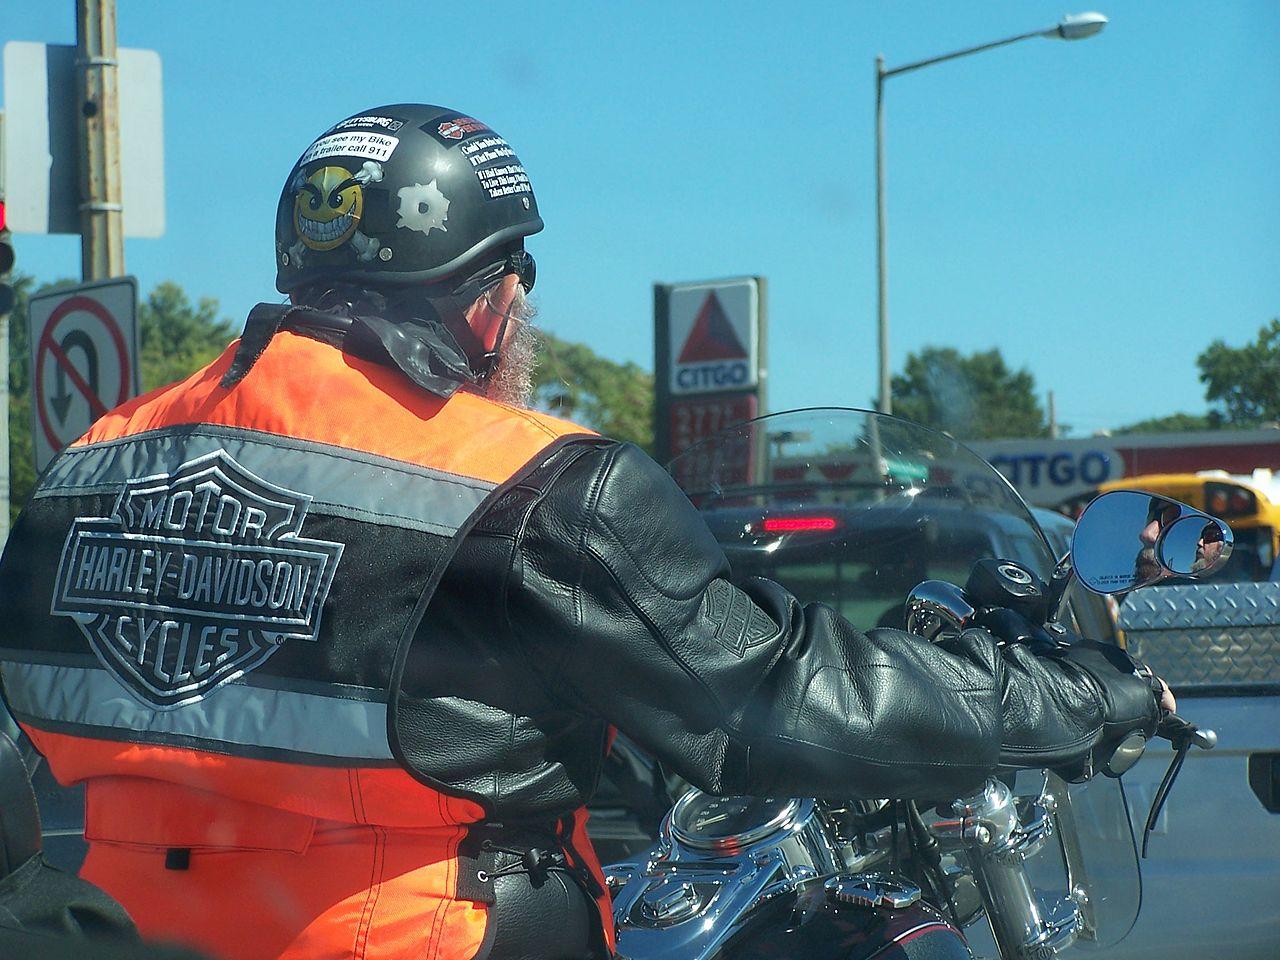 Rider on motorcycle wearing Harley vest